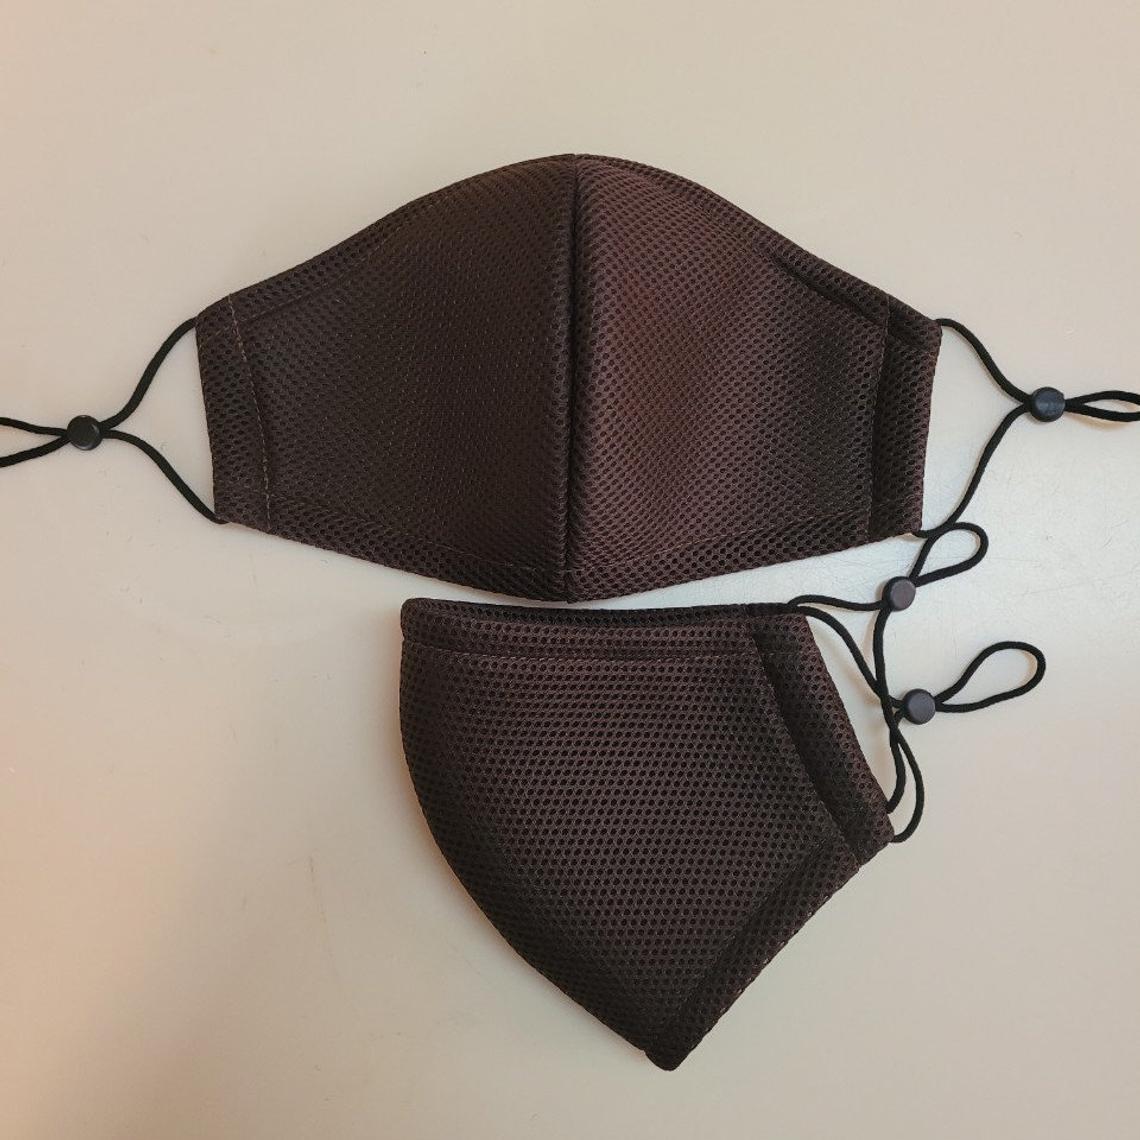 Single layer Mesh Mask Breathable Reusable Adult